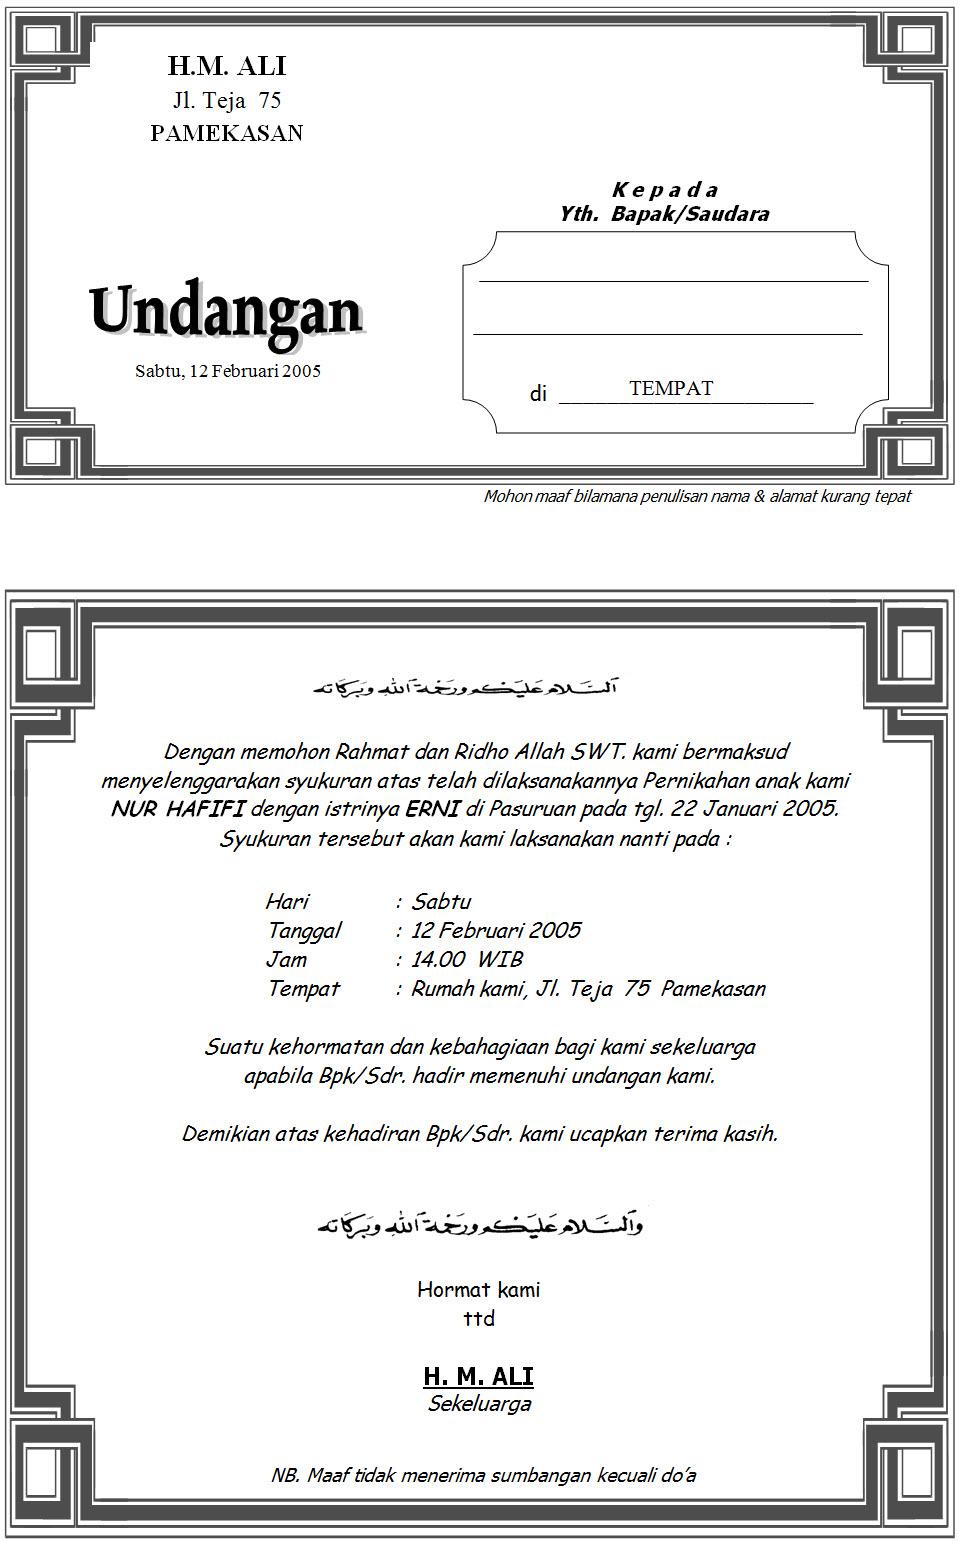 Contoh Surat Undangan Walimatul Ursy - Surat Box